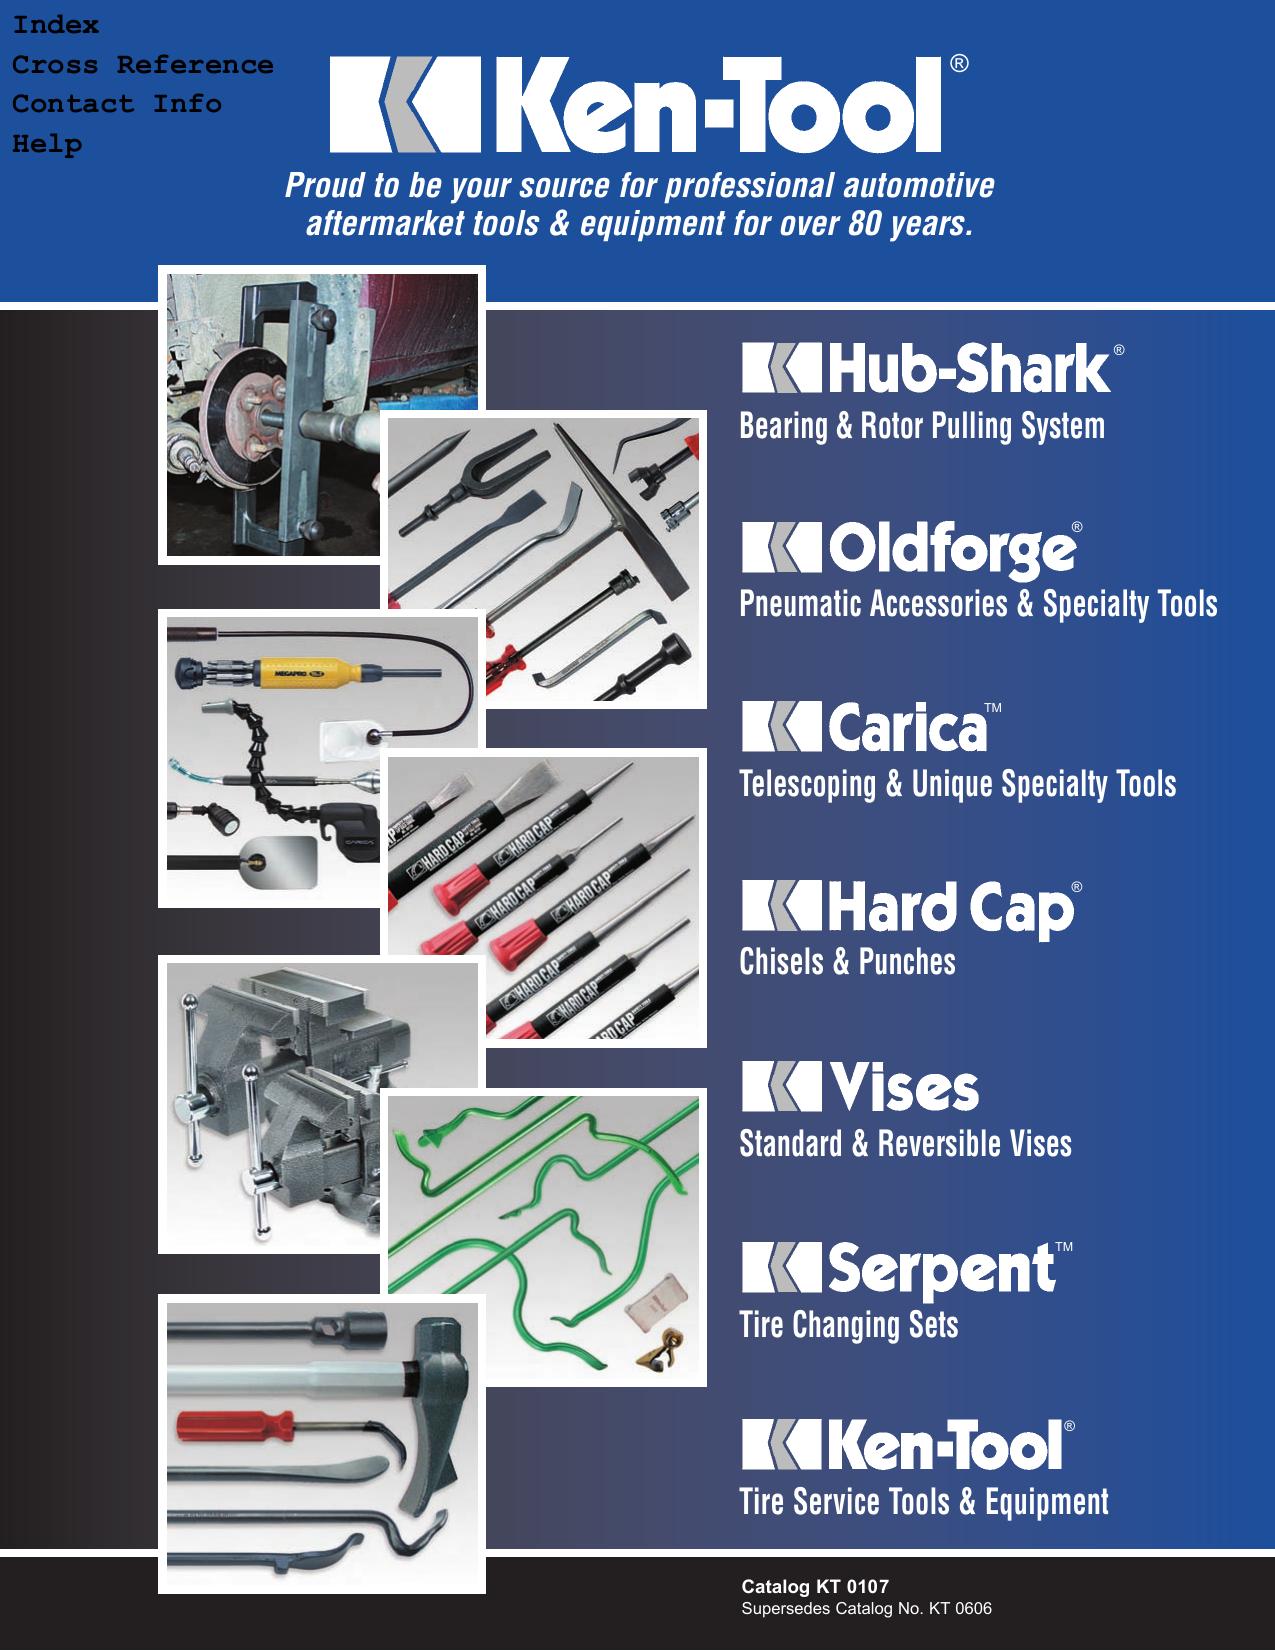 5-Pc Ken-Tool Super Serpent Tire Changing Tools Model Number 35446 Set